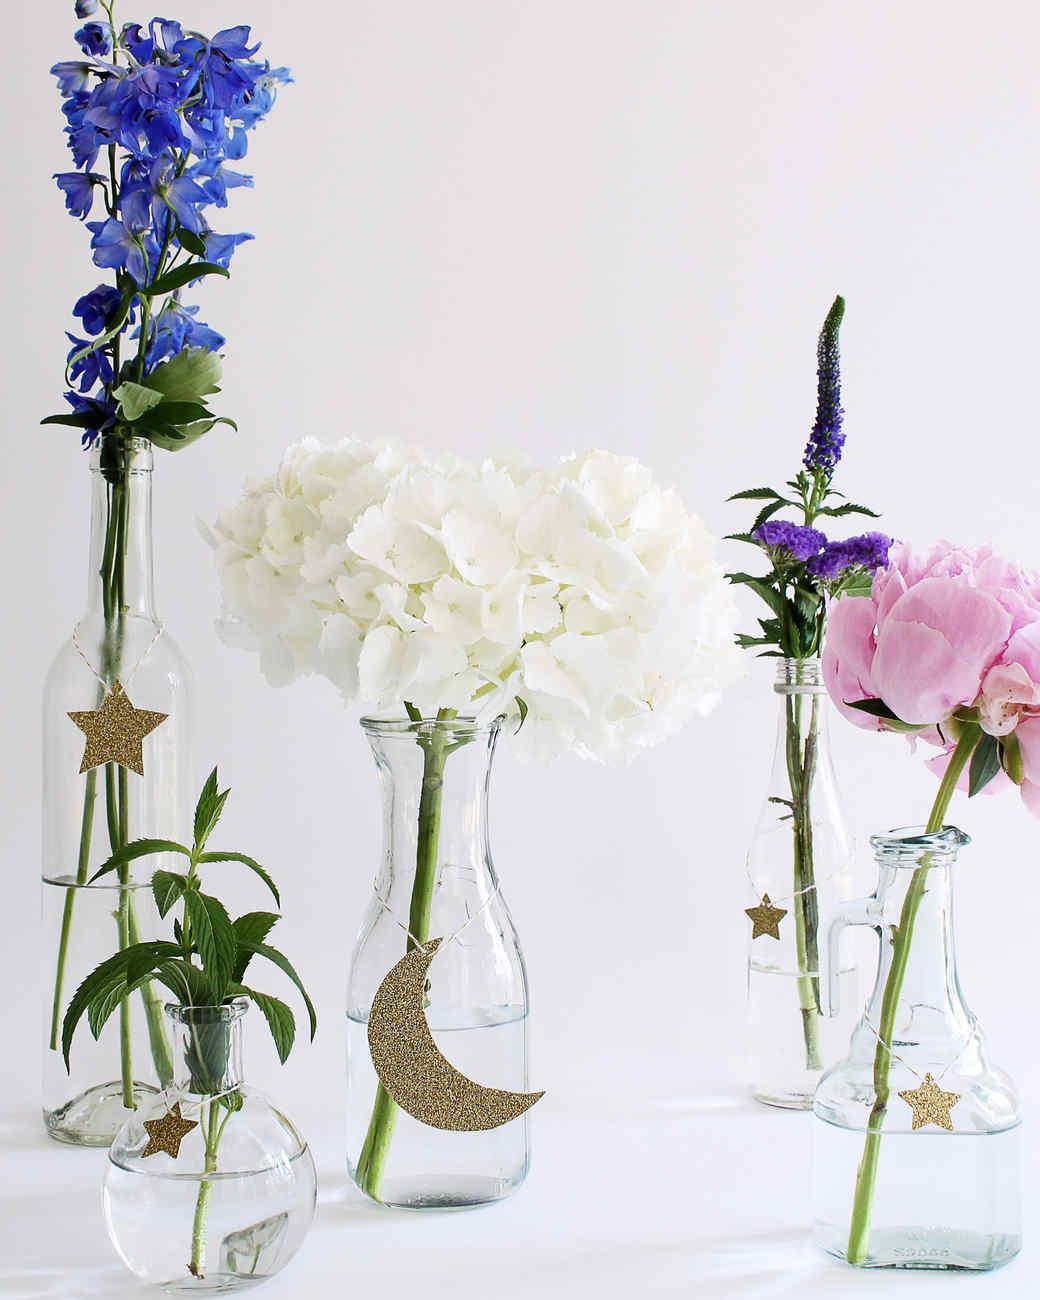 Best Table Eid Al-Fitr Decorations - eid-al-fitr-flower-centerpieces_vert  Photograph_271346 .jpg?itok\u003ded-IOQBt